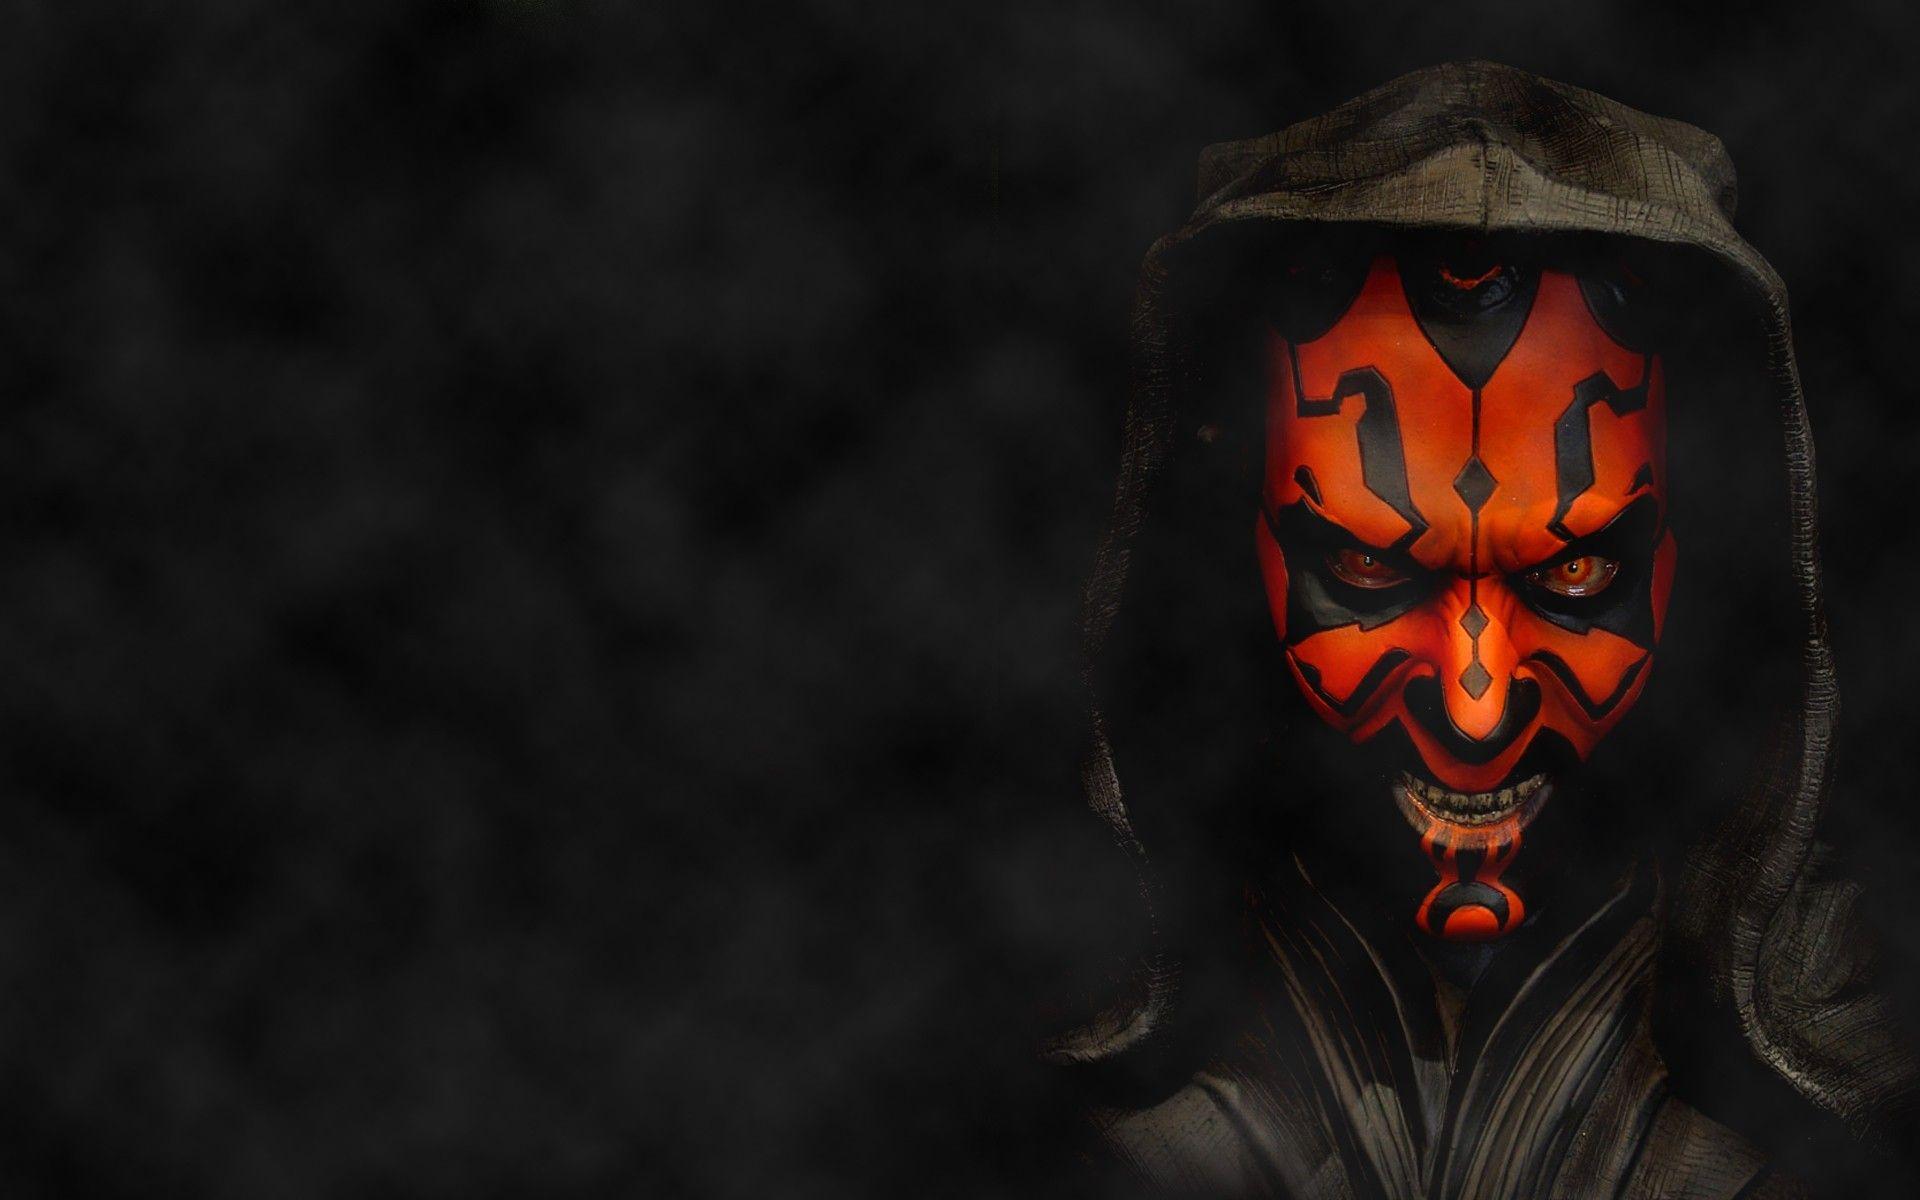 Devil Face Wallpaper 34526